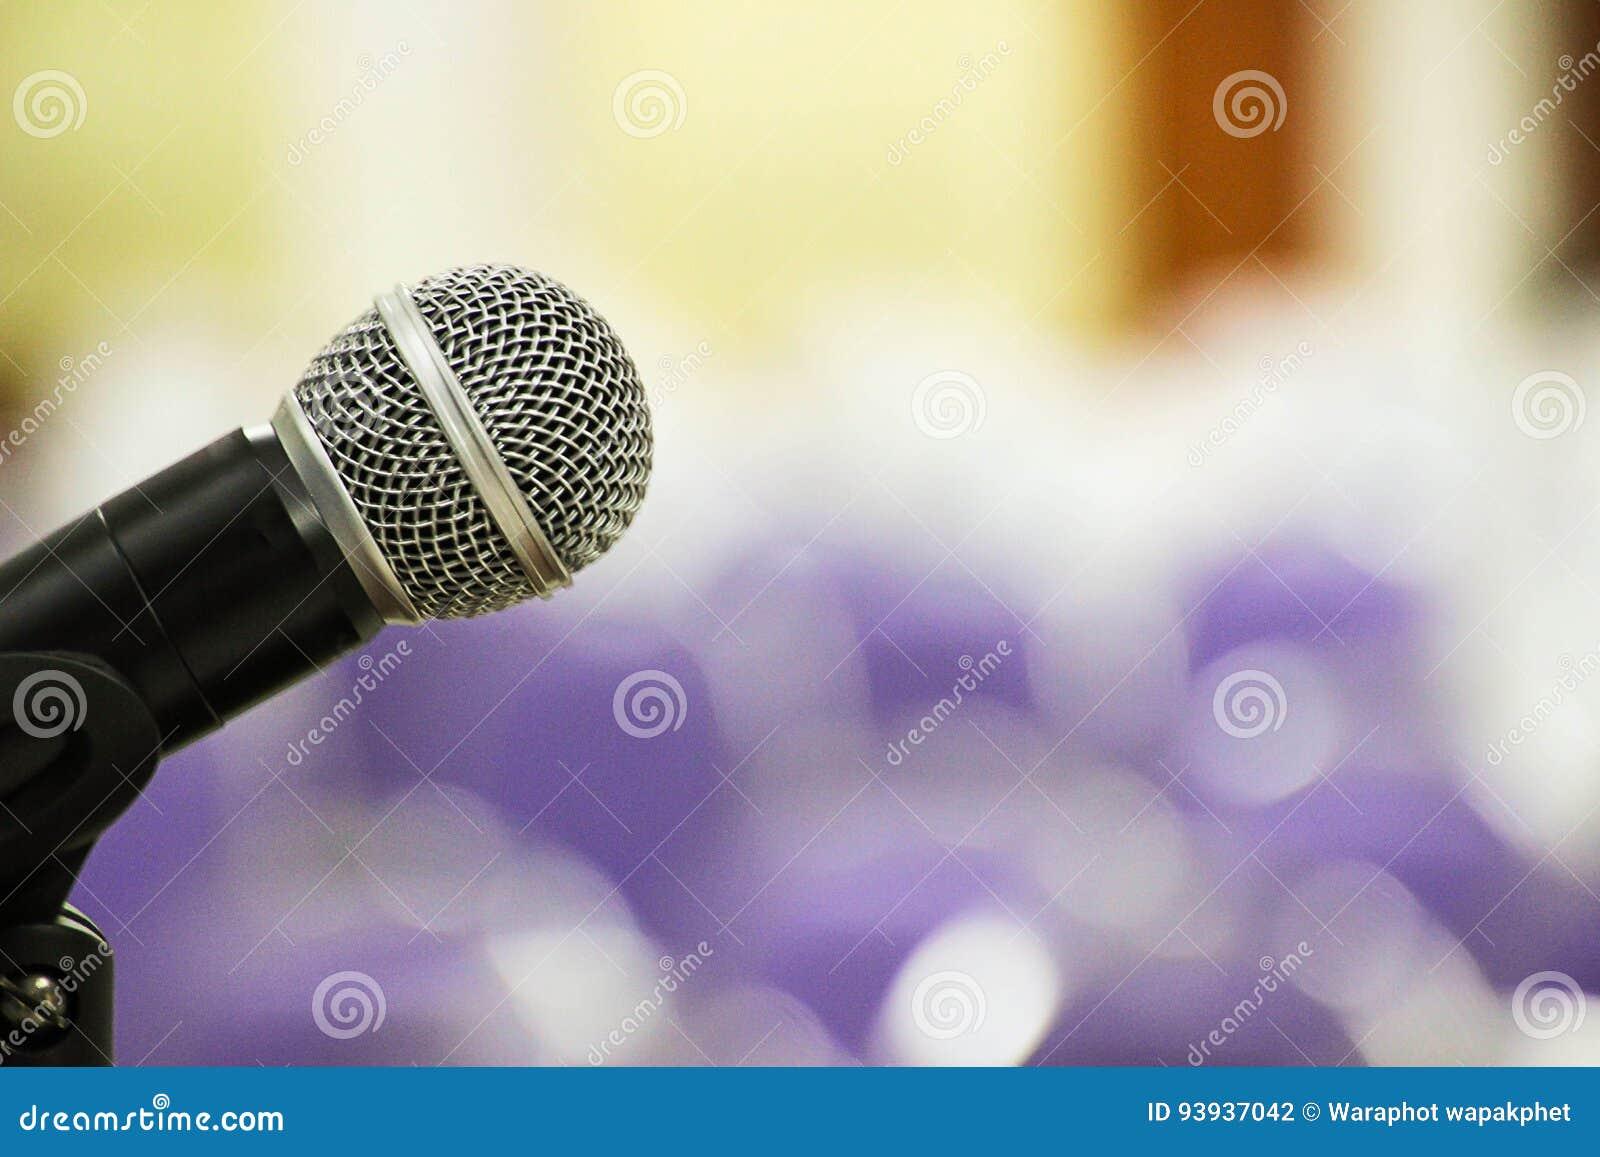 Microphone, music, audio, sound, mic, equipment, , musical, studio, mike, concert